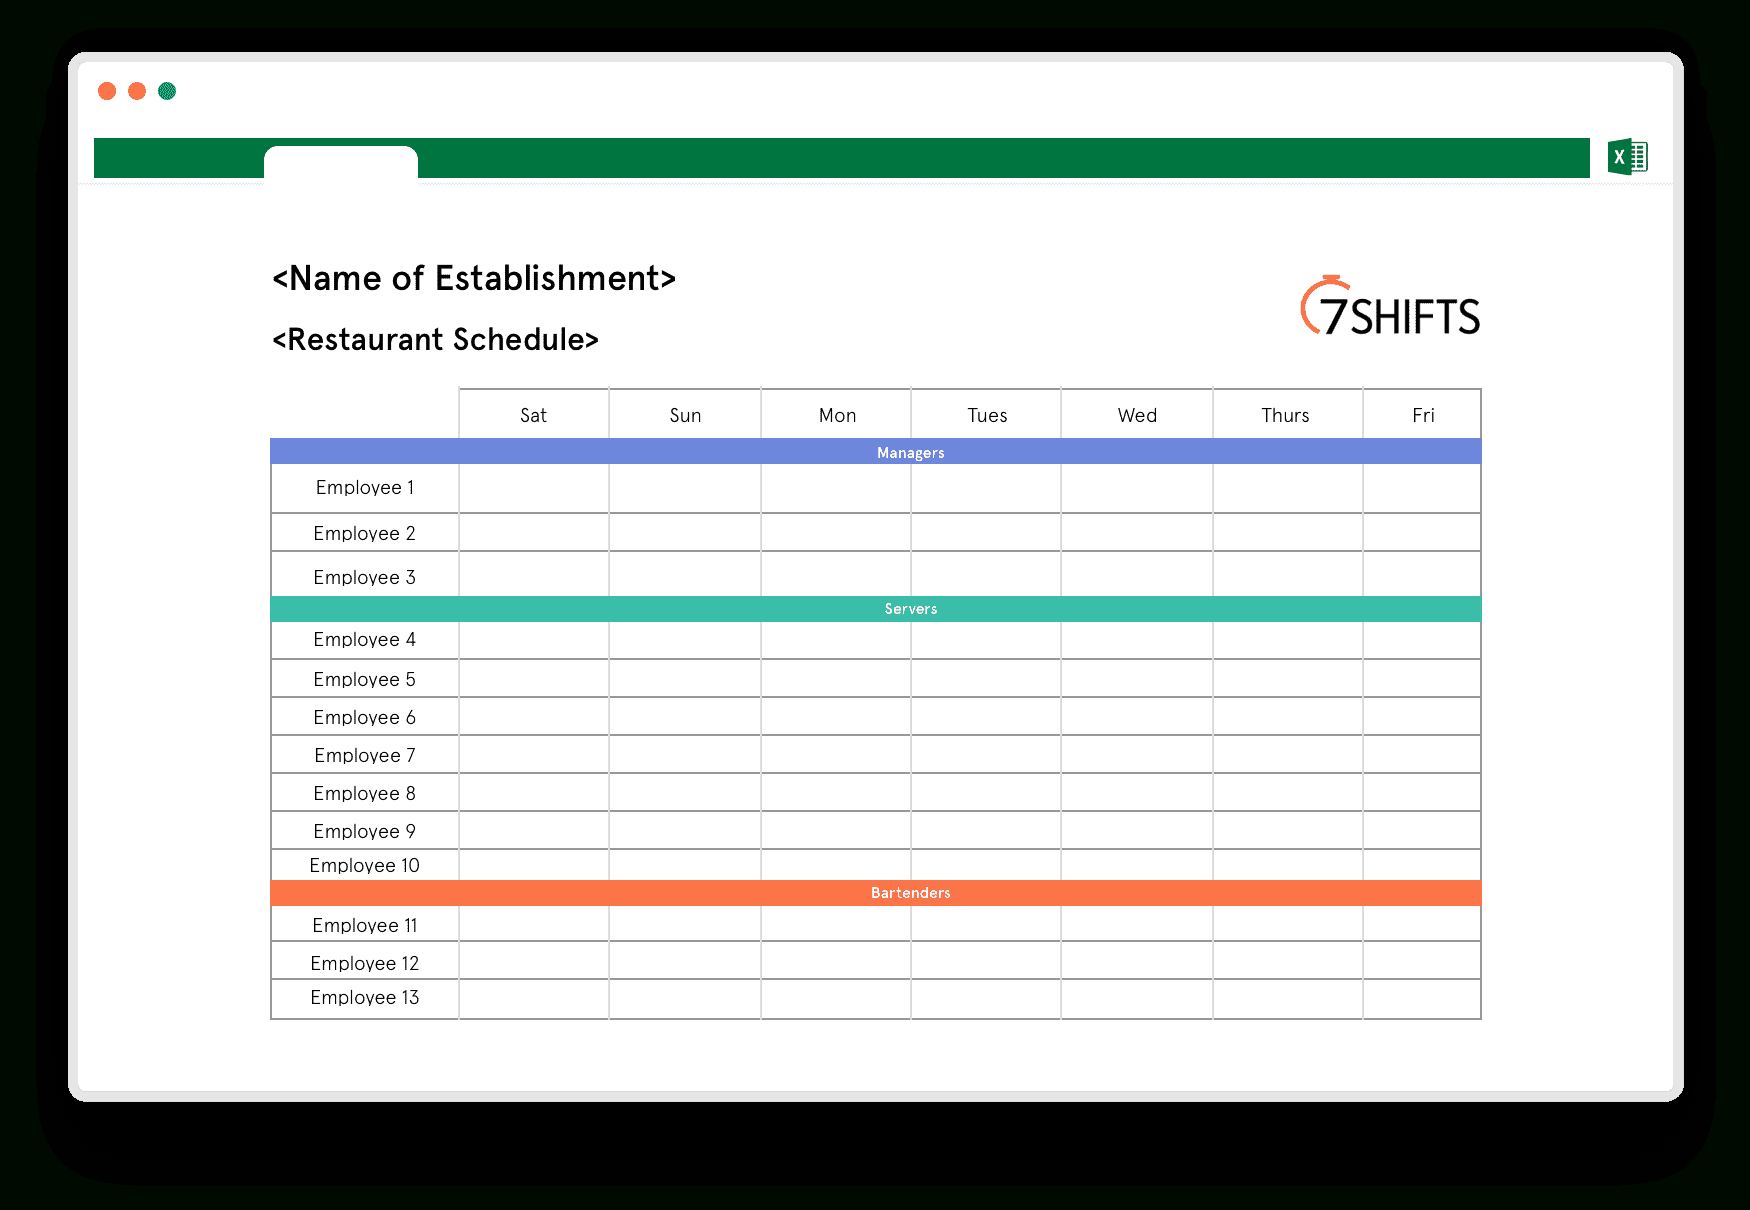 Restaurant Schedule Excel Template | 7Shifts regarding 3 Day Shift Restaurant Template Sheets Excel